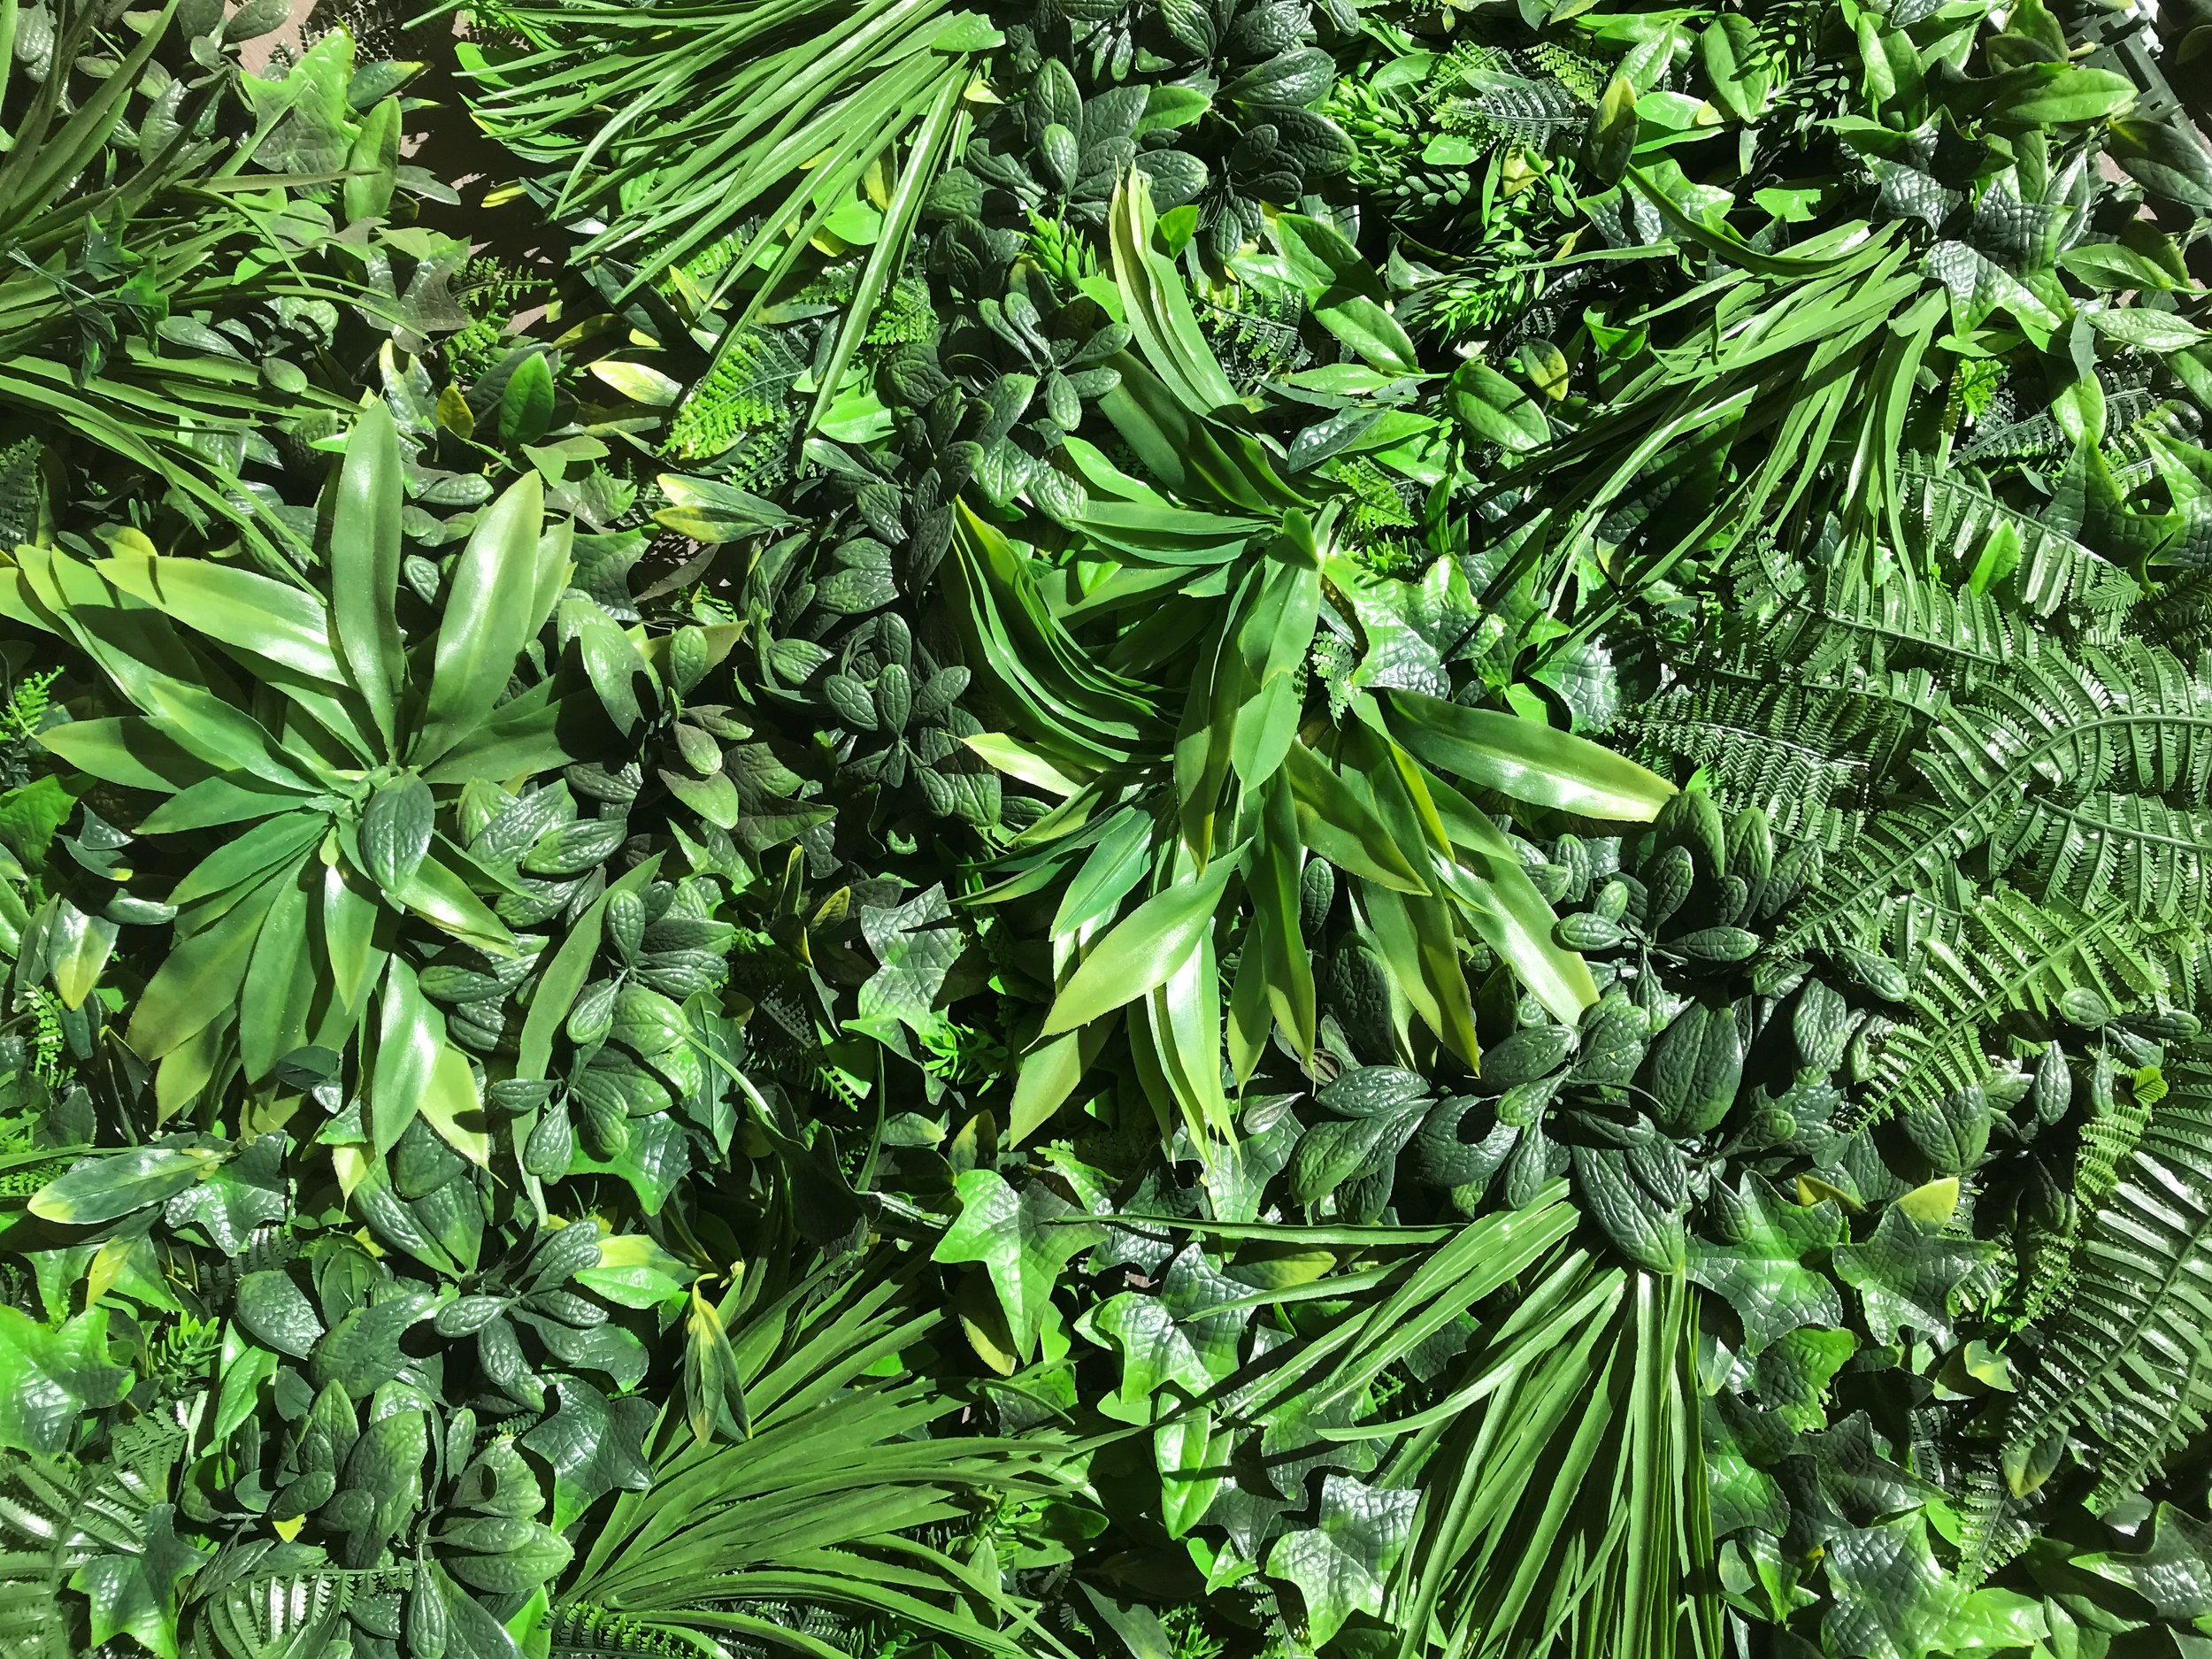 Jungle Backdrop  Price: $120.00  Qty: 1